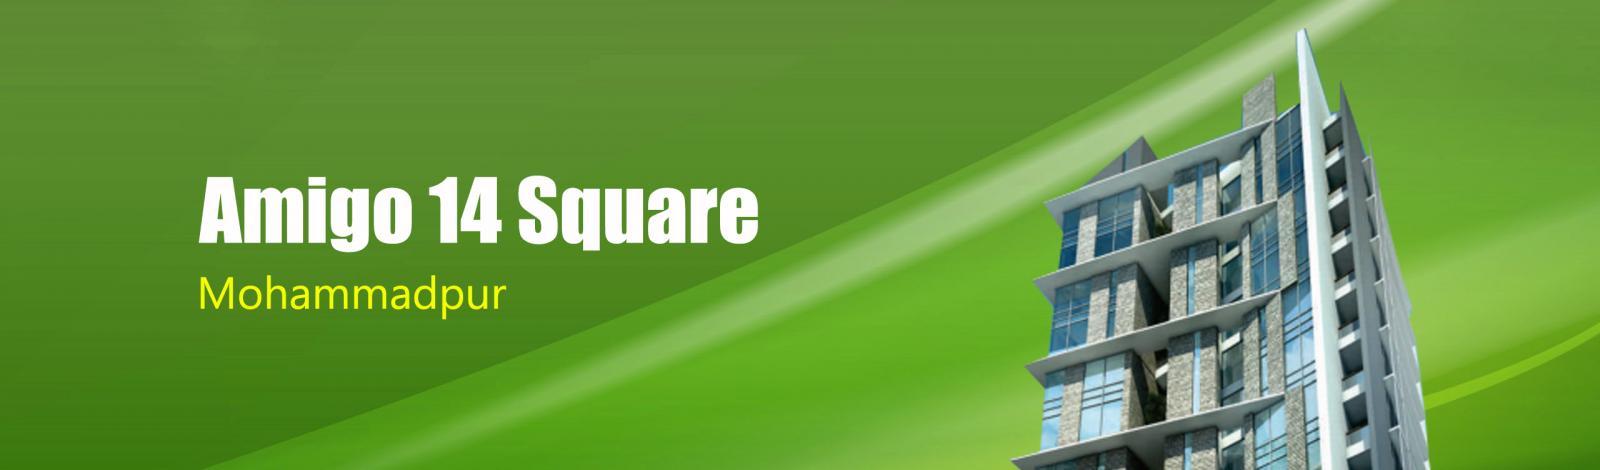 Amigo Properties & Developments Ltd. banner